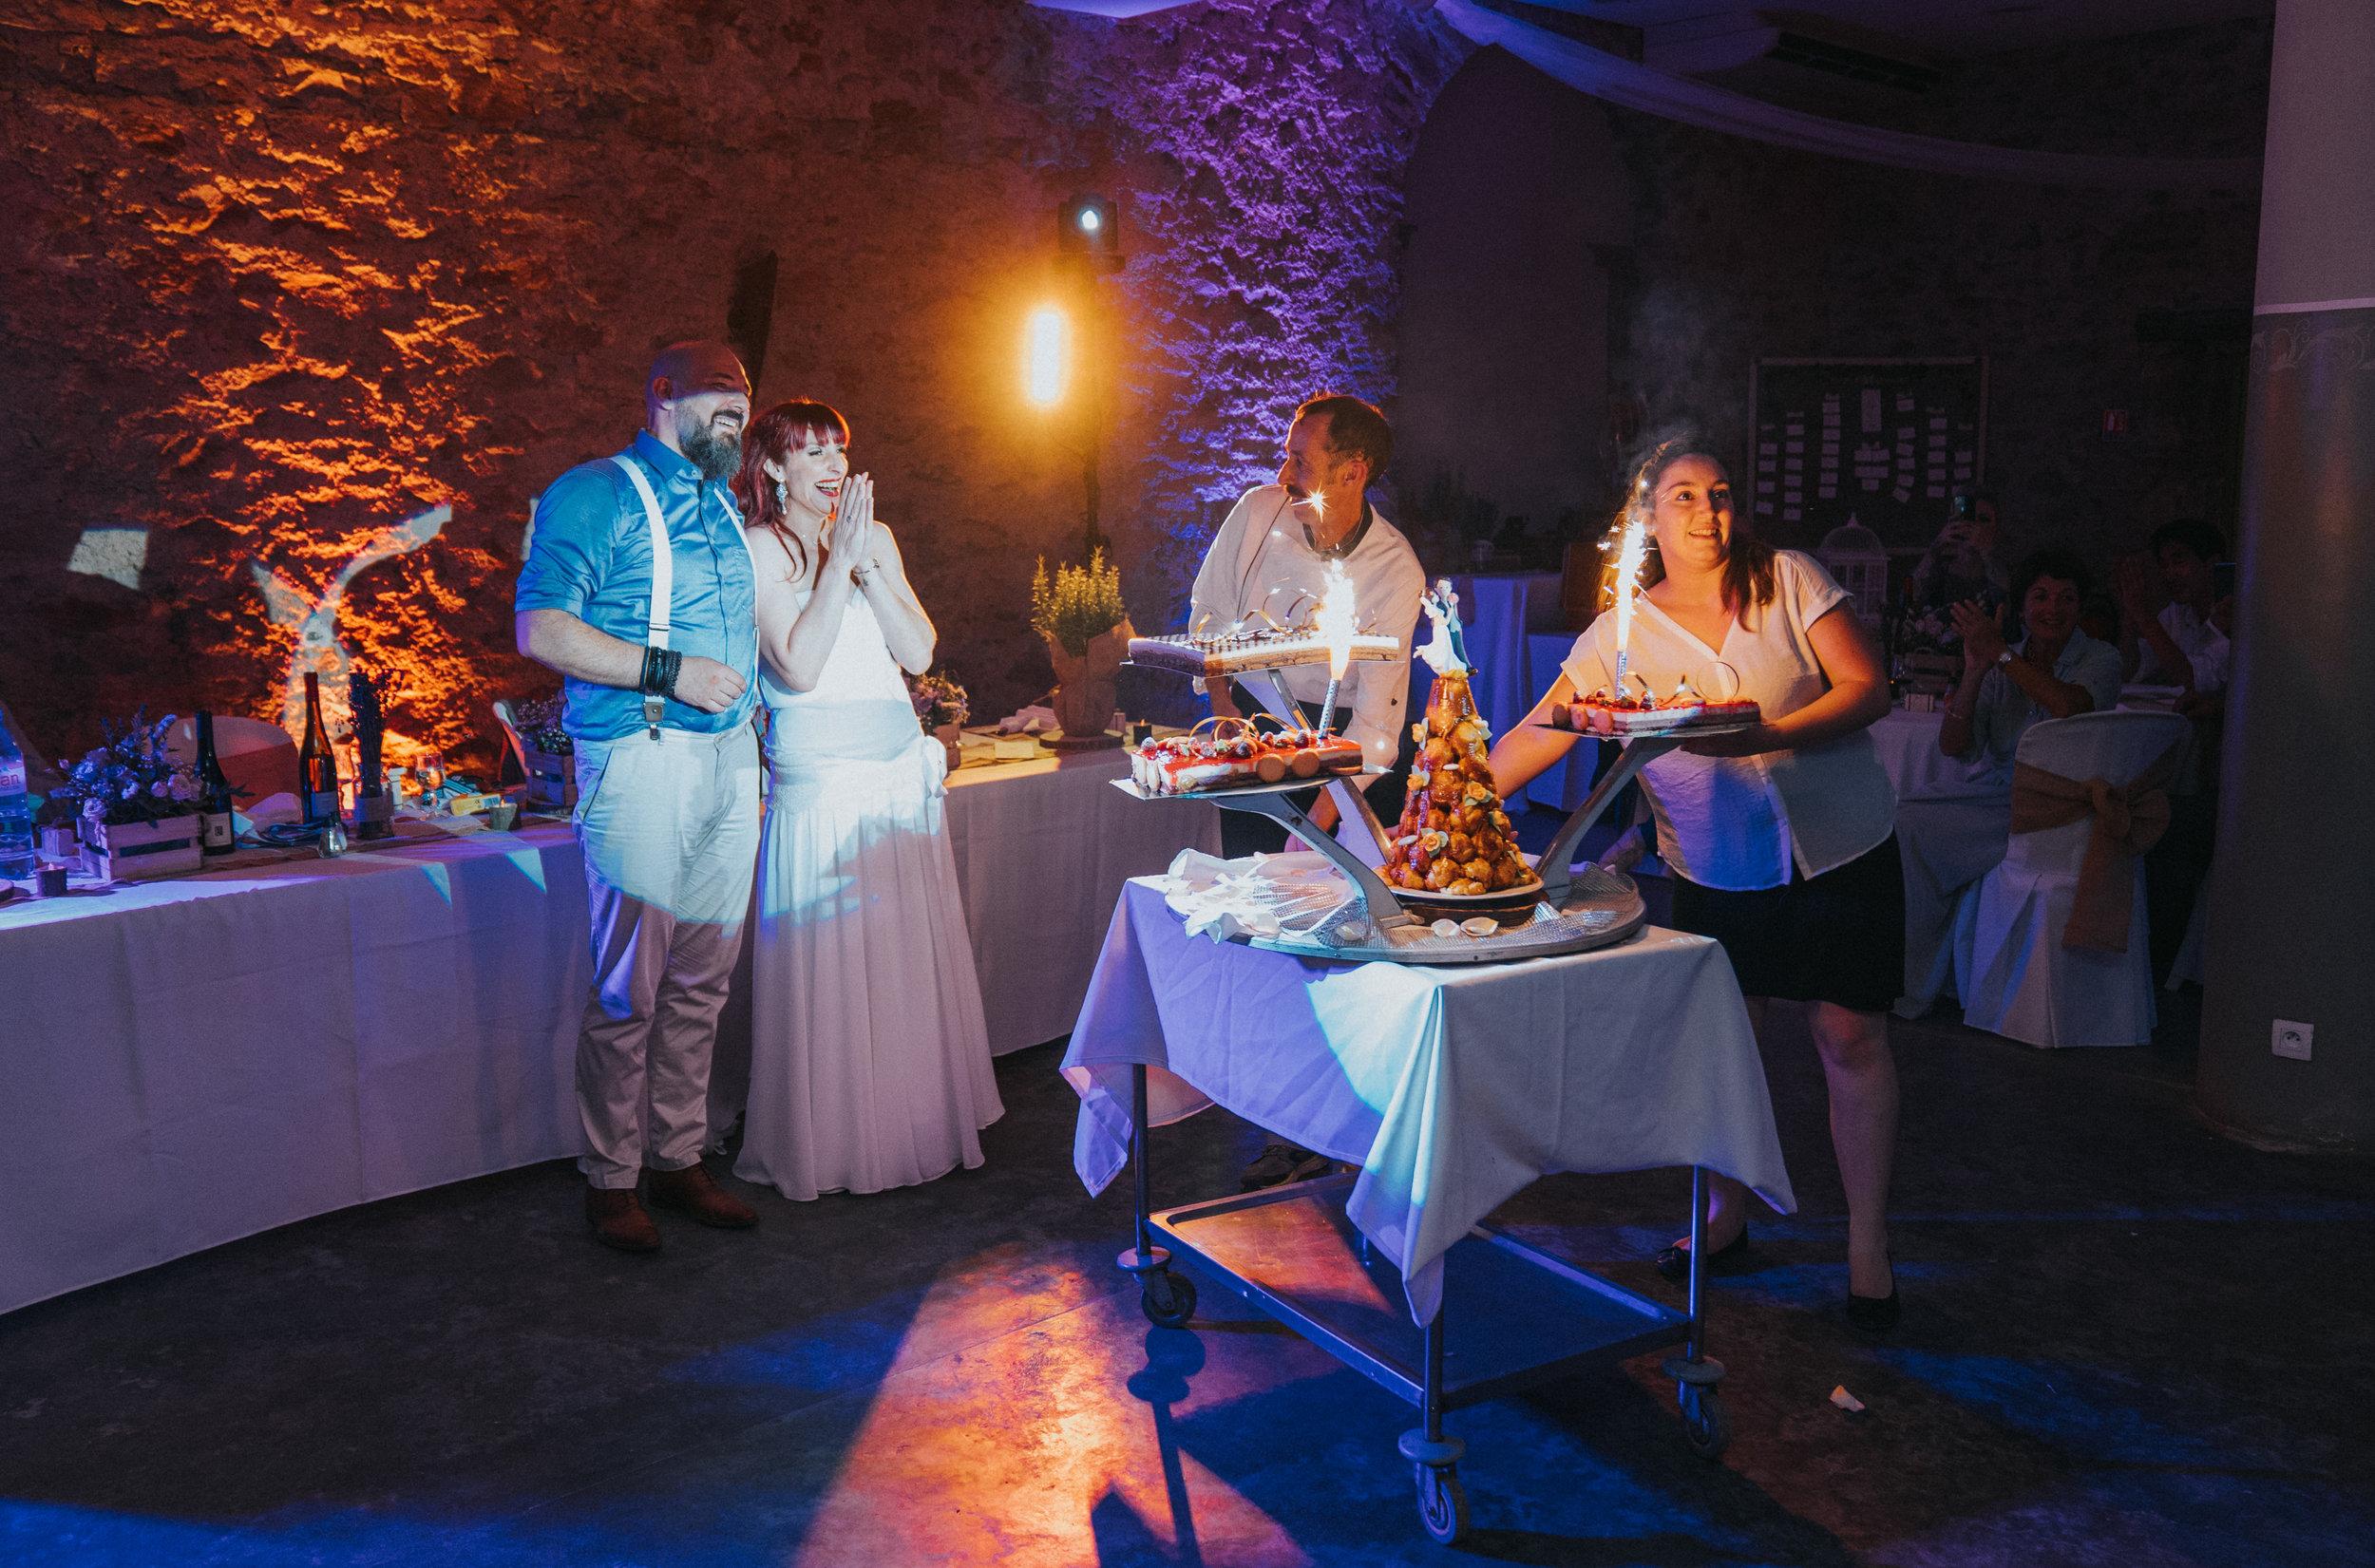 french-farmhouse-wedding-photography-carcassonne-france-101